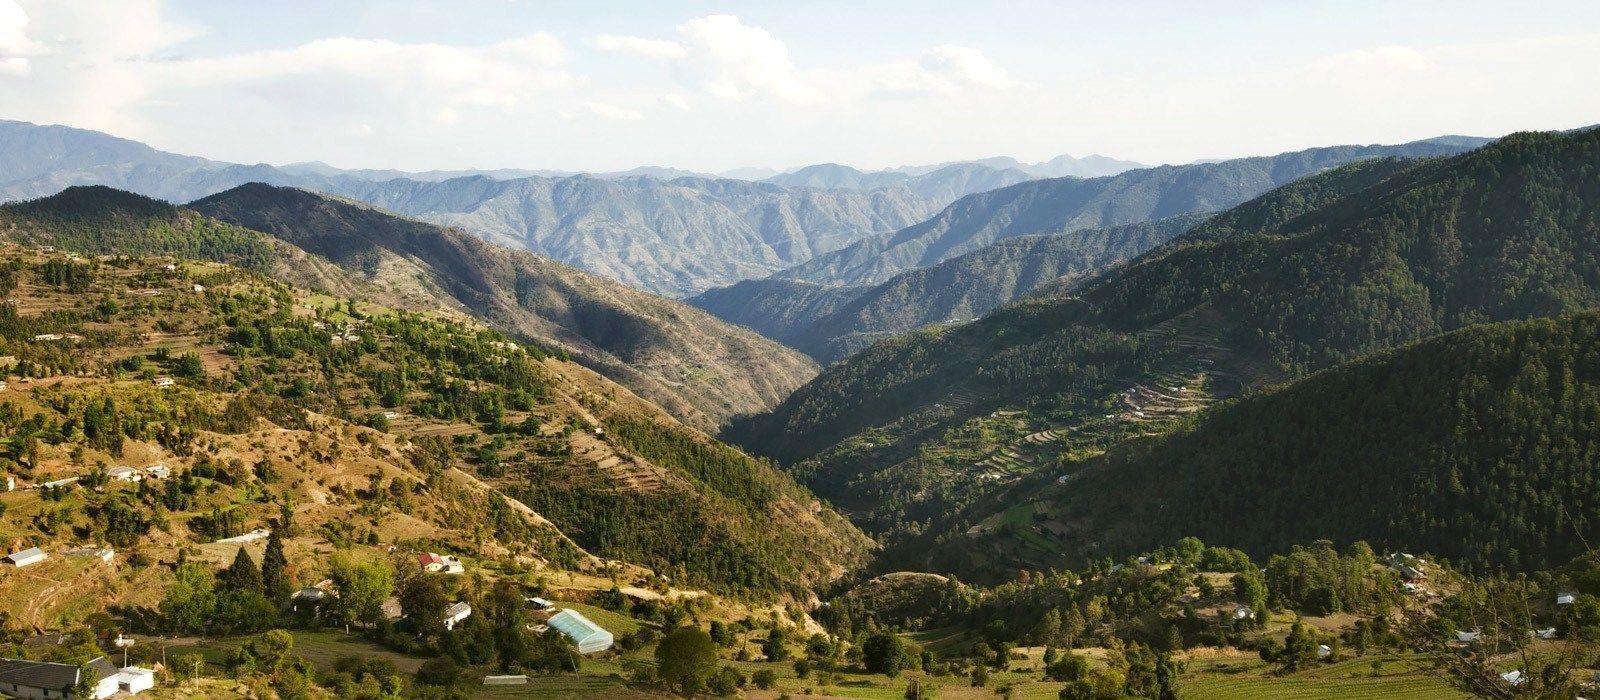 Darjeeling: Teegenuss & Berge Urlaub 4